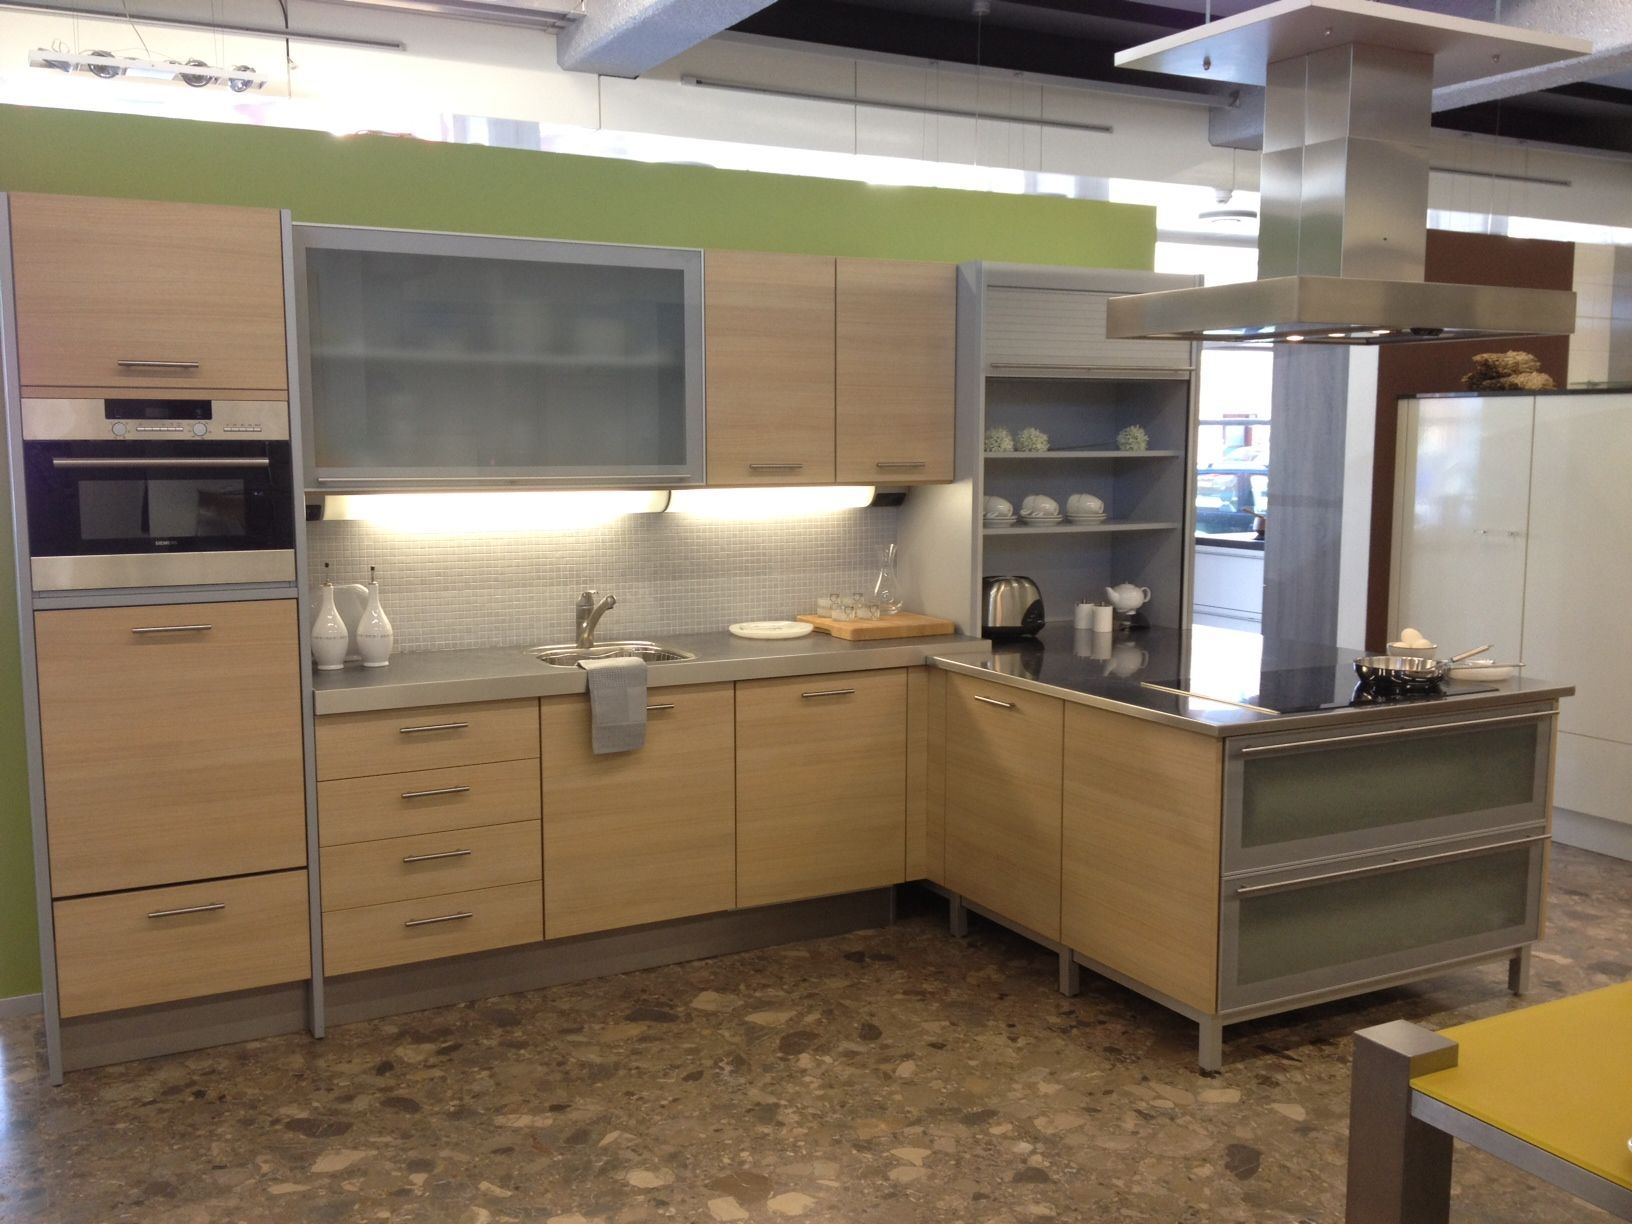 Allergrootste keukensite van nederland licht eiken titaan hoek keuken 45352 - Keuken licht eiken ...